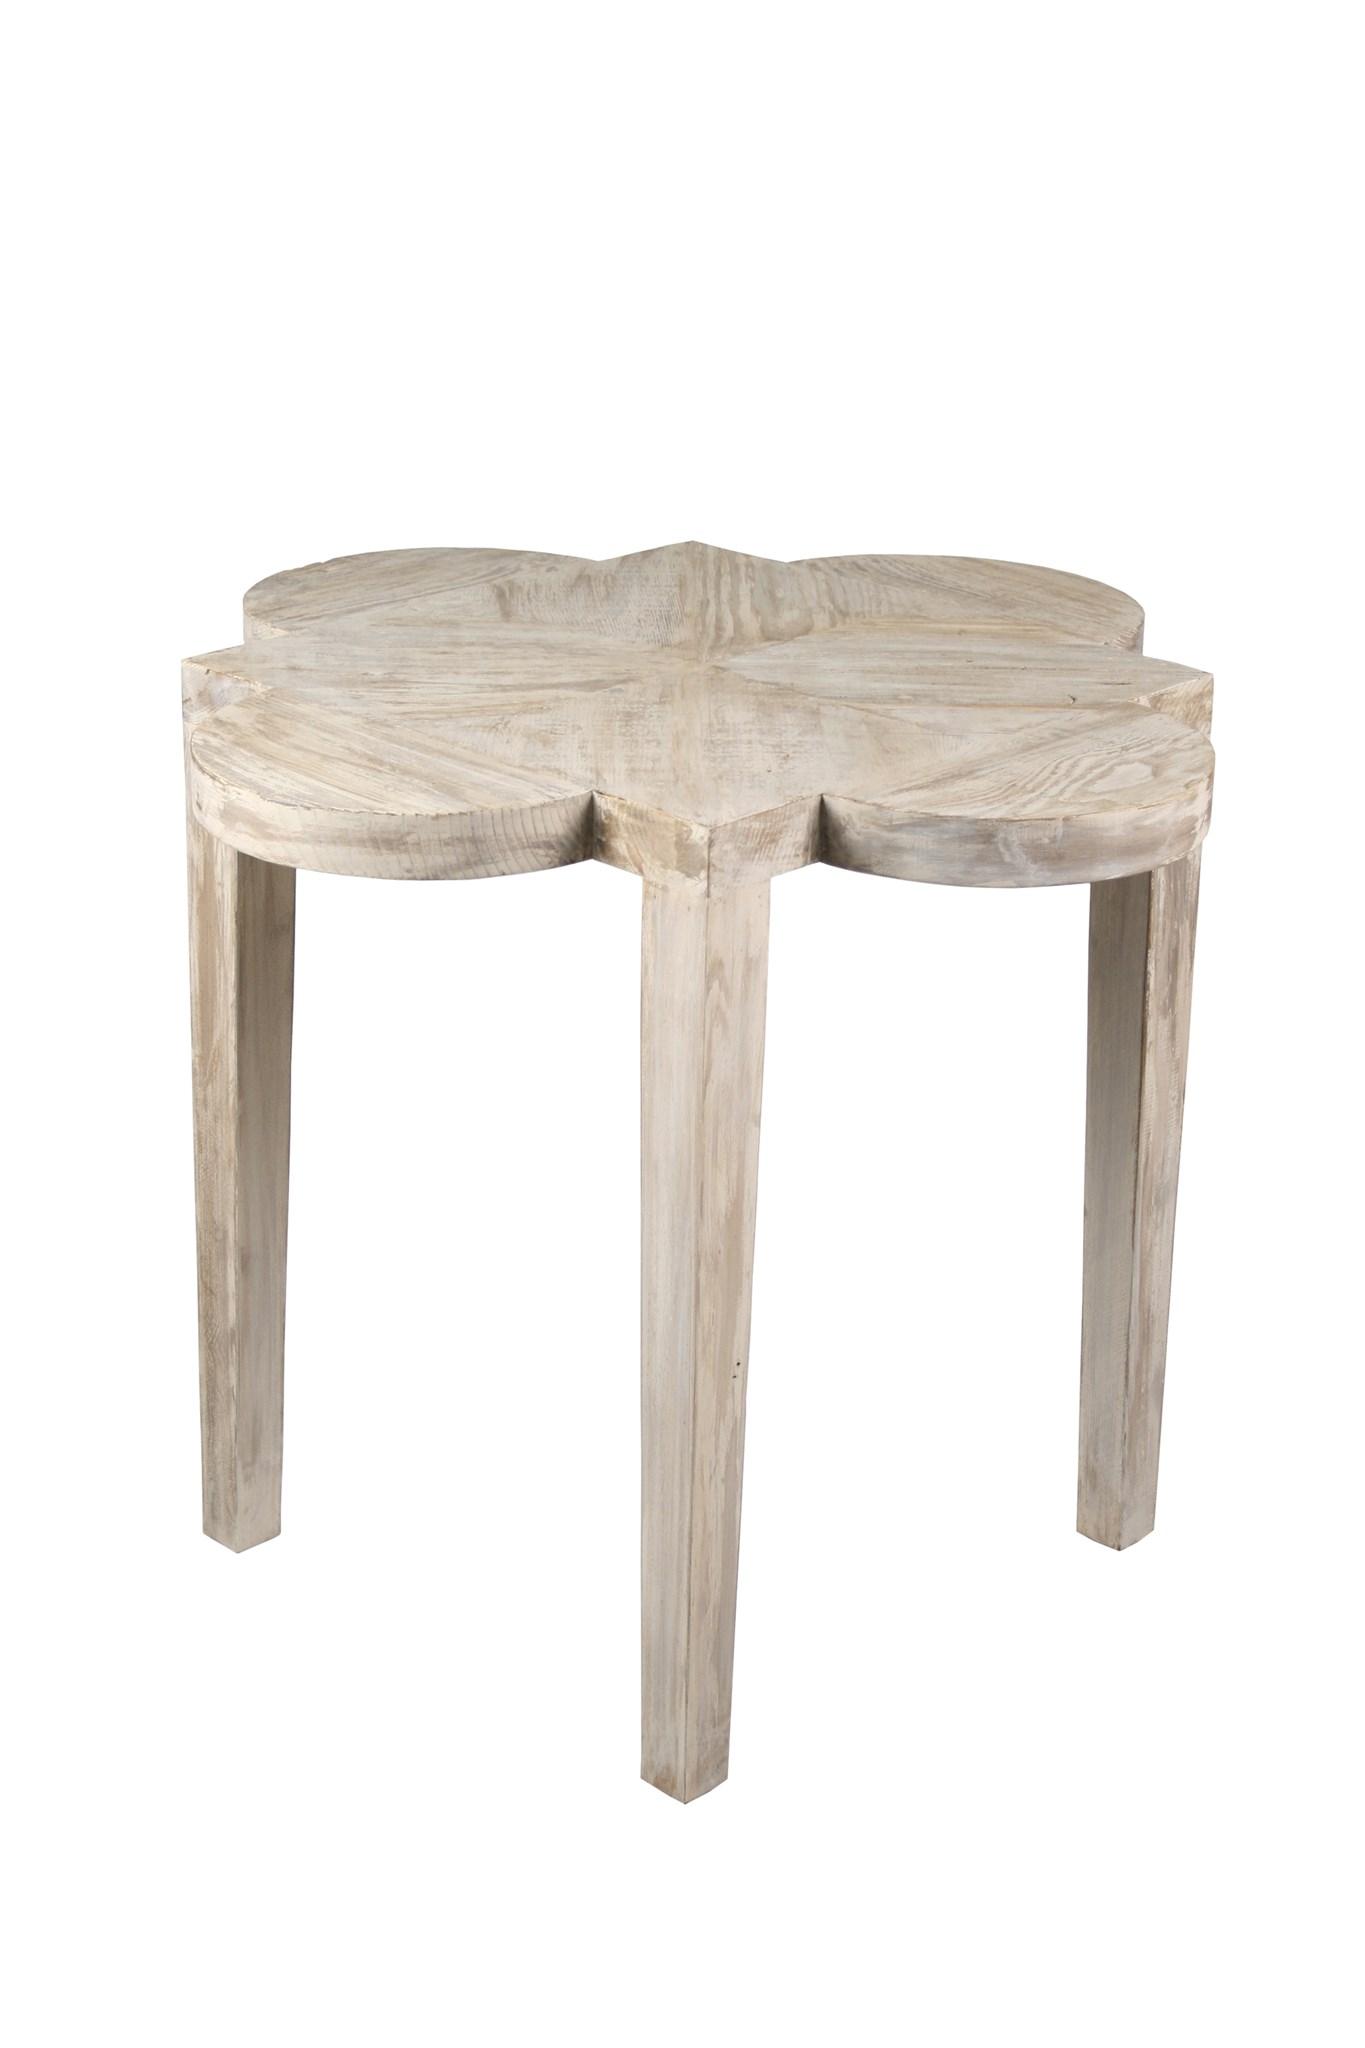 Quatrefoil Reclaimed Wood Side Table Mecox Gardens